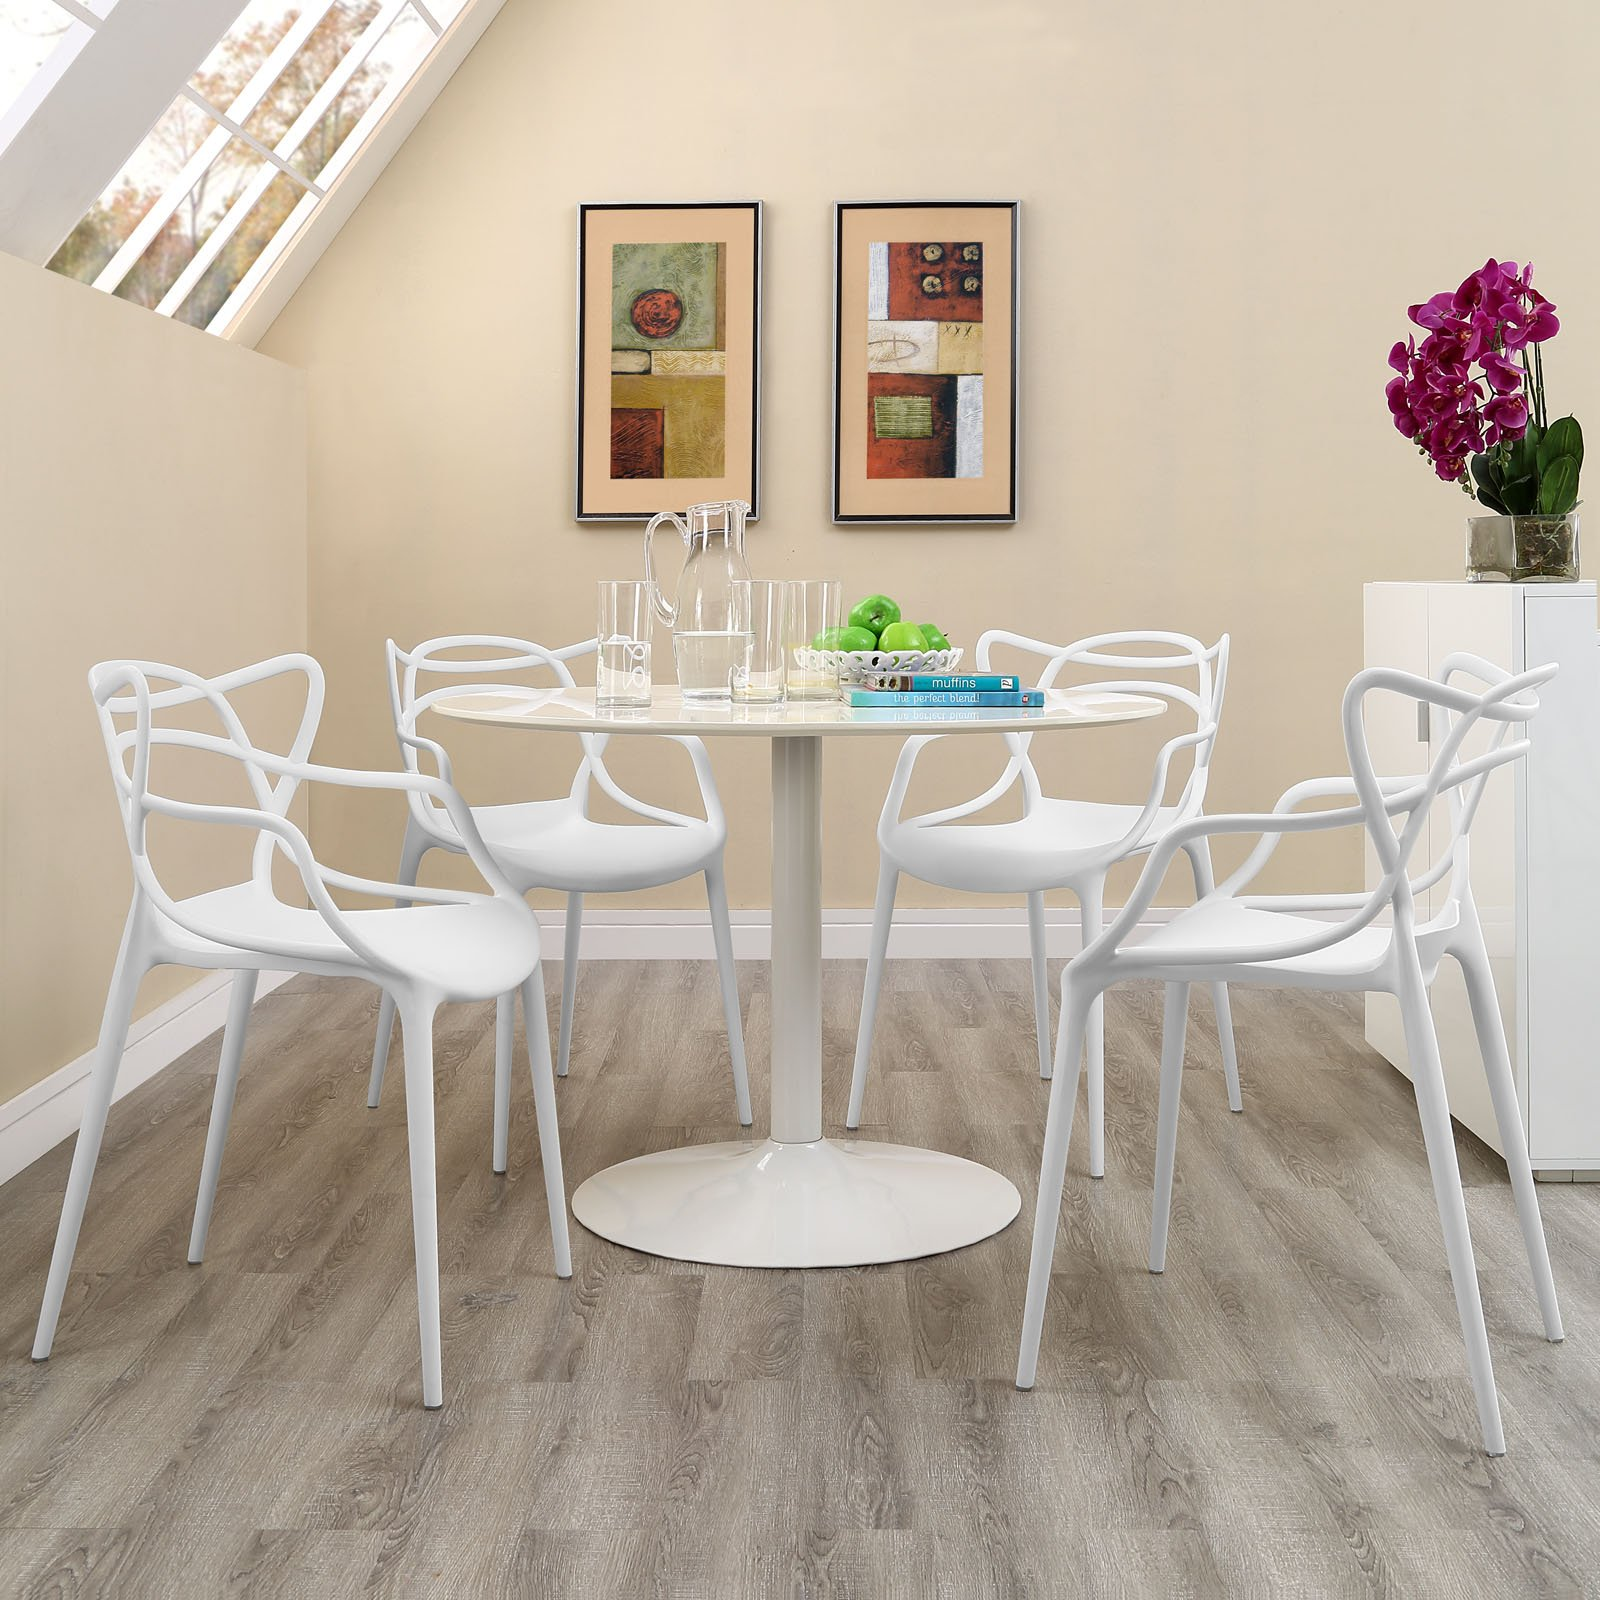 Modway Entangled Dining Set (Set of 4), White by Modway (Image #4)